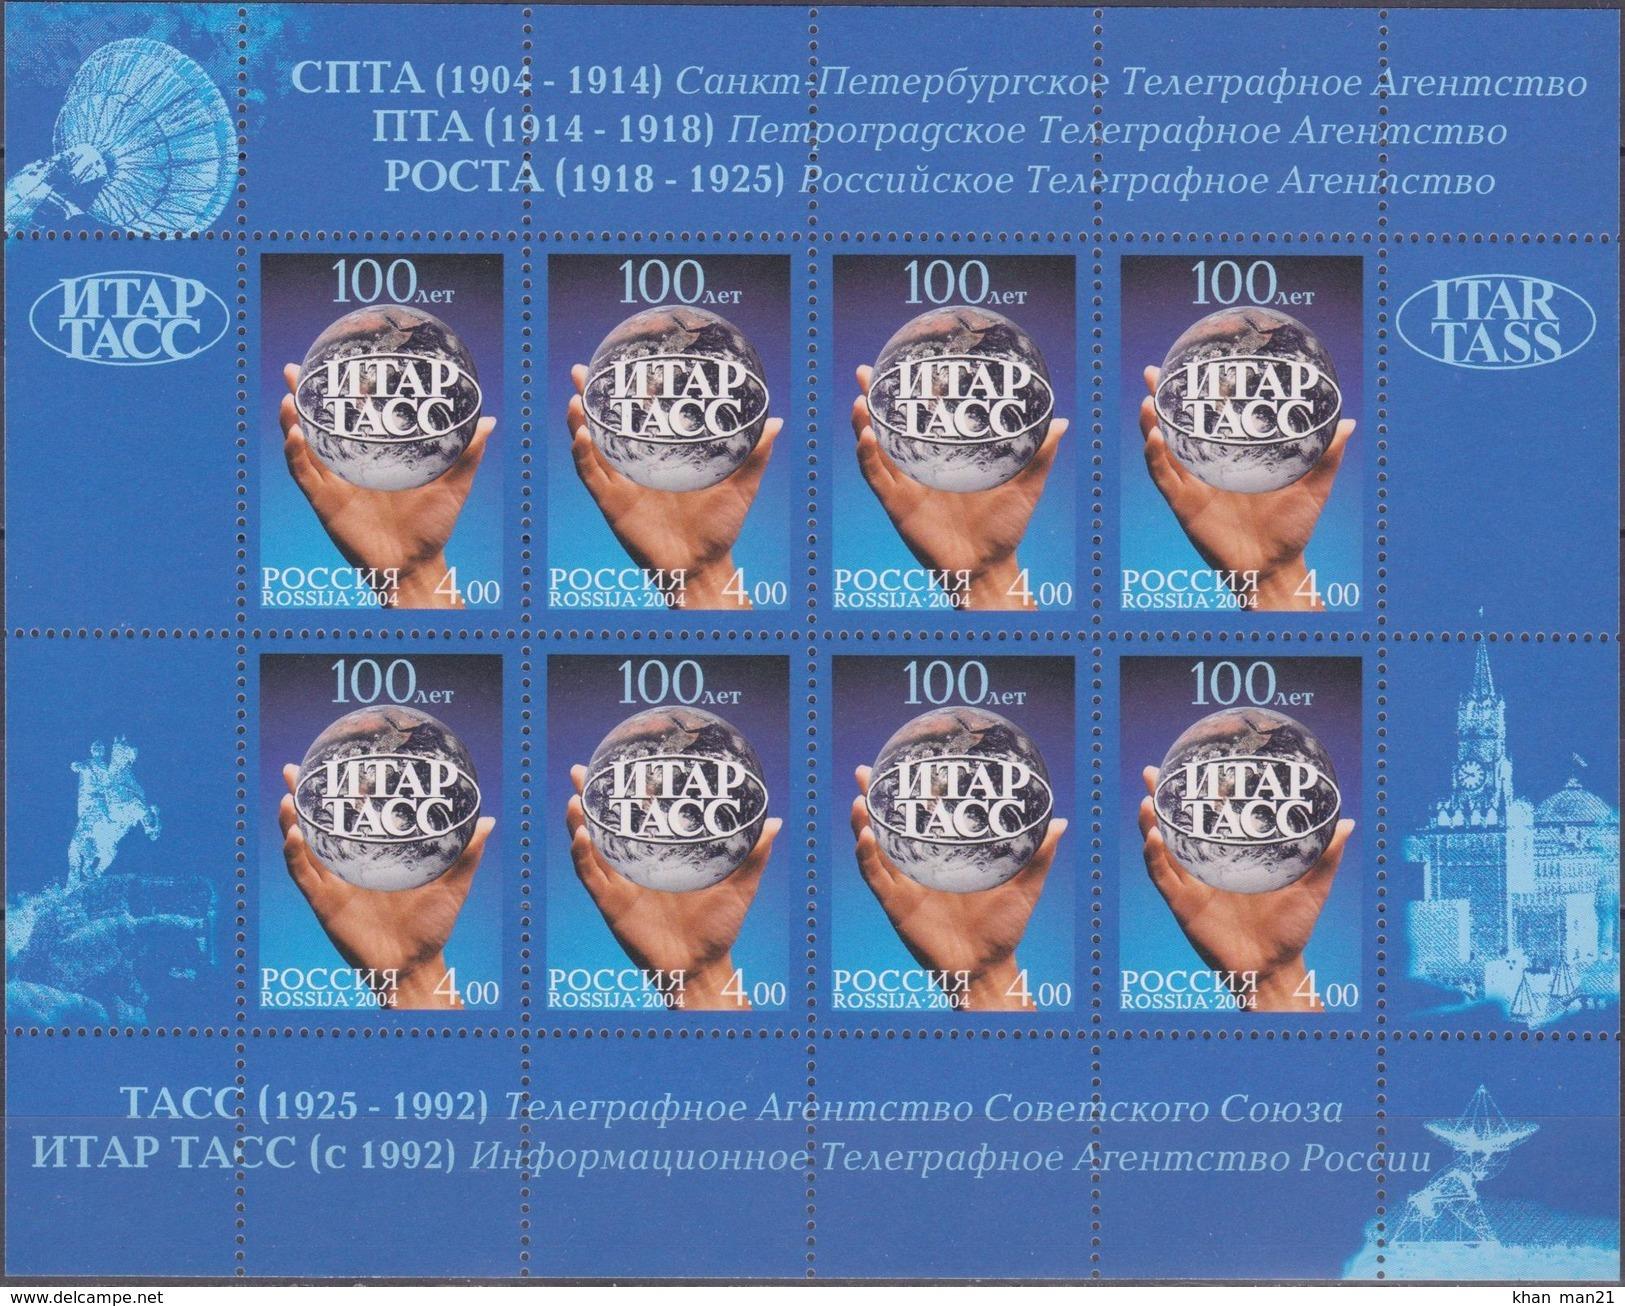 Russia, 2004, Mi. 1203, Sc. 6859, SG 7293, The 100th Anniv. Of Russian News Agency TASS, MNH - Nuevos